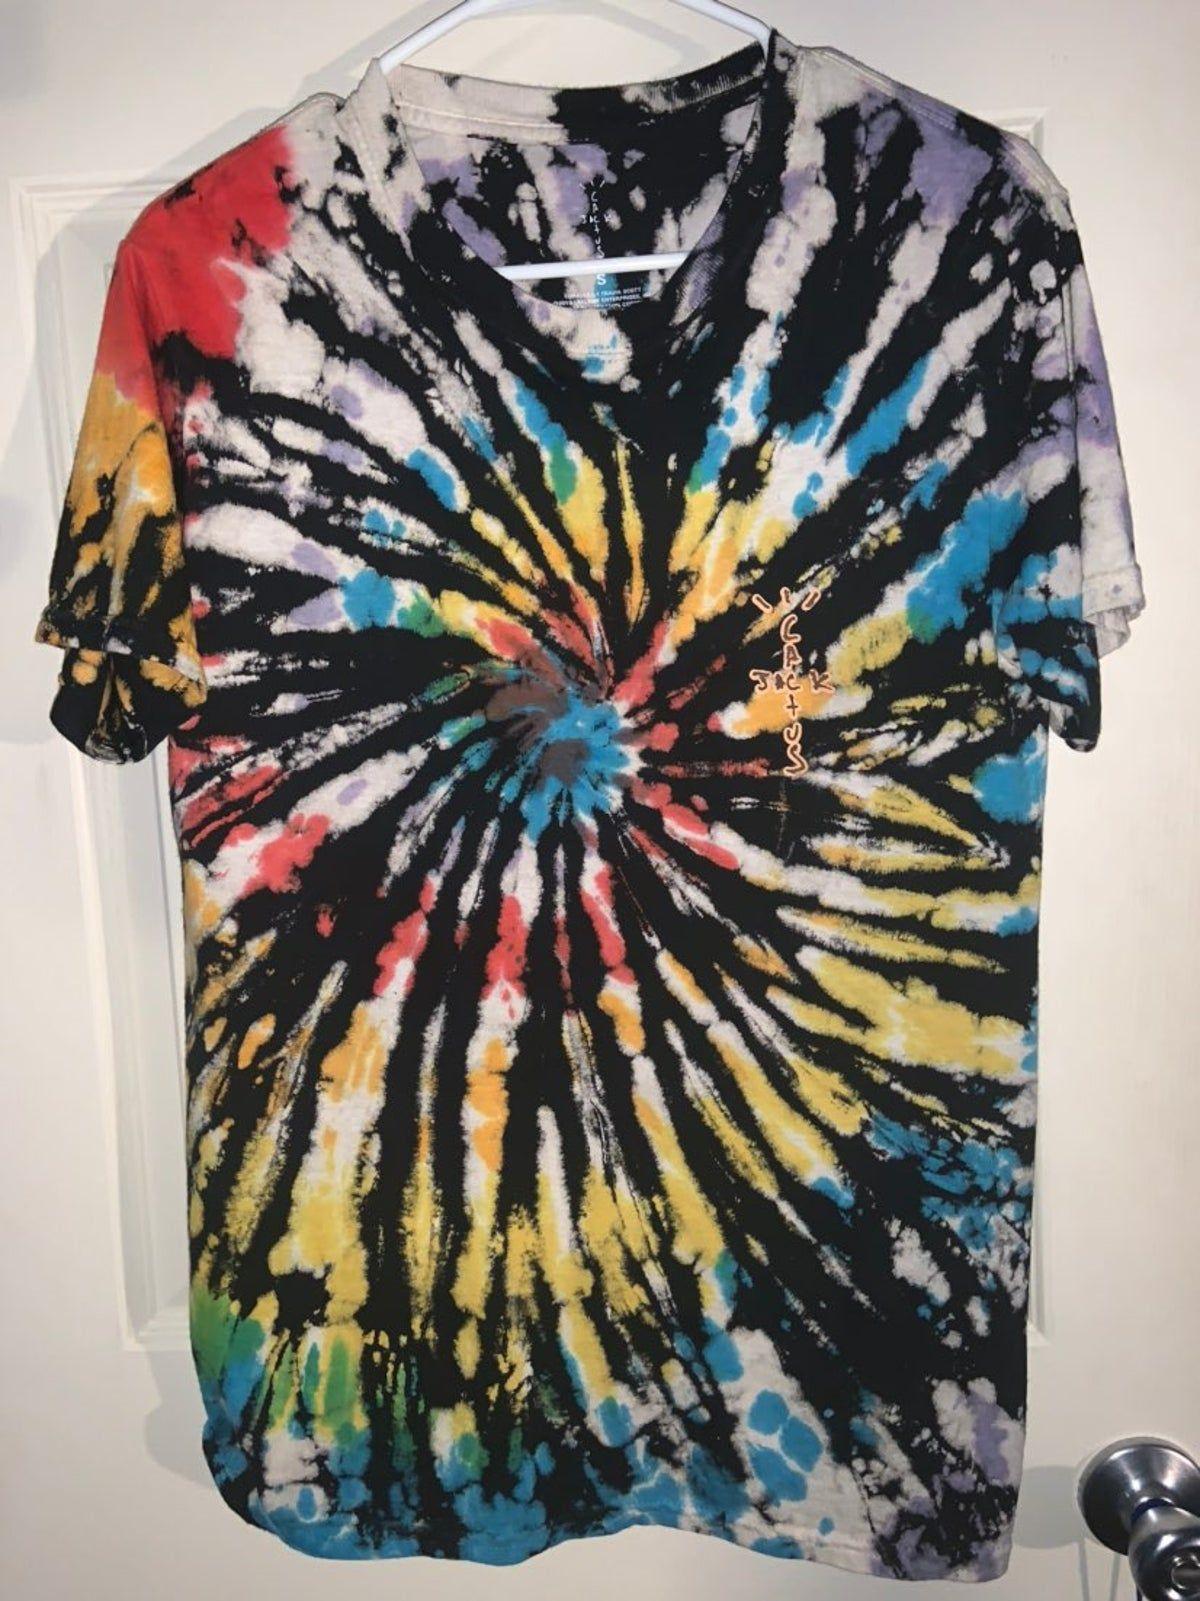 Travis Scott Highest In The Room Shirt In 2021 Tie Dye Shirts Patterns Tie Dye Shirts Shirts [ 1601 x 1200 Pixel ]